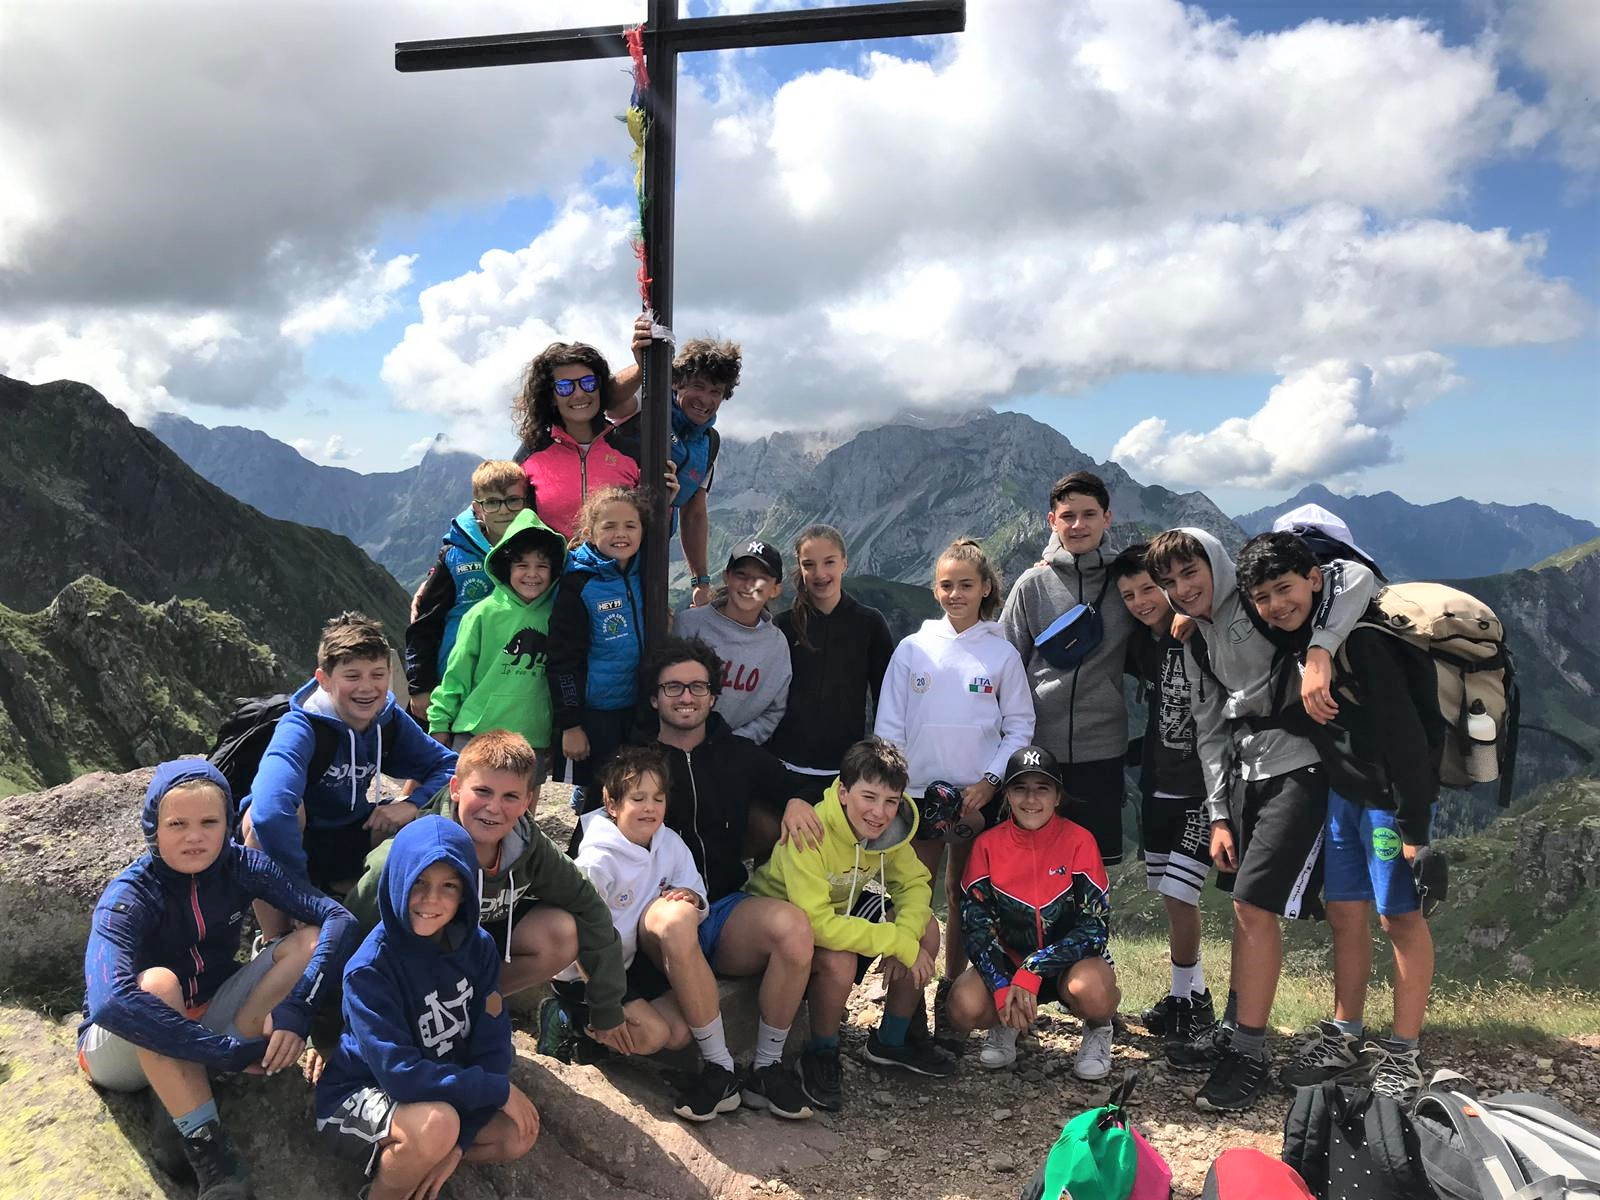 Gita-ai-Laghi-Gemelli-16-17-Luglio-2019-15